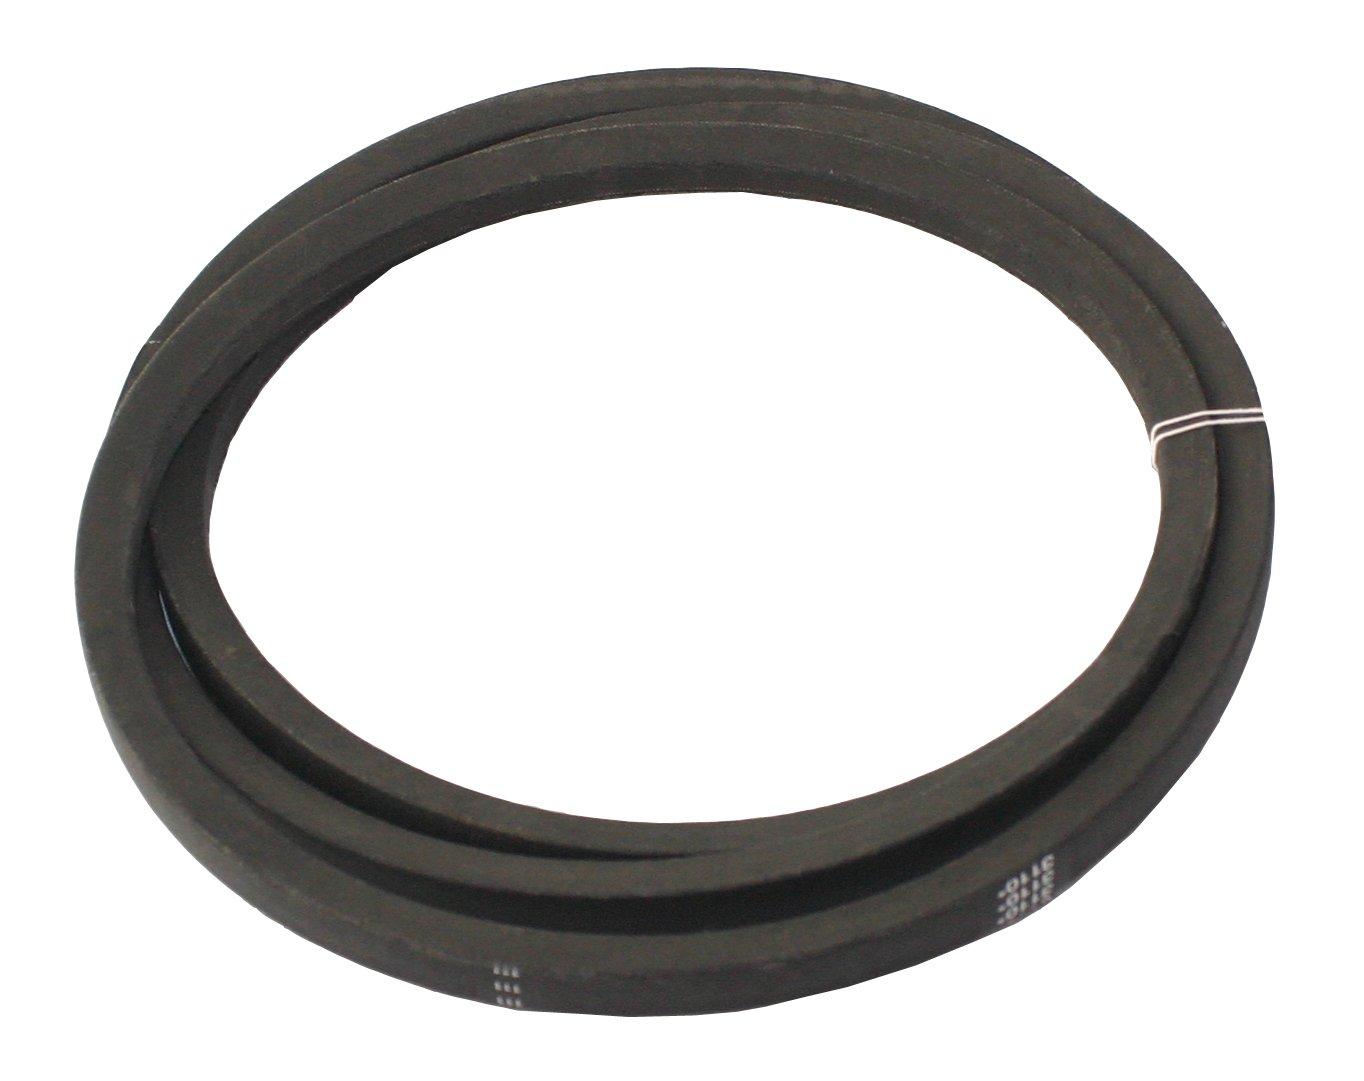 Husqvarna 532148763 Replacement Belt For Husqvarna/Poulan/Roper/Craftsman/Weed Eater